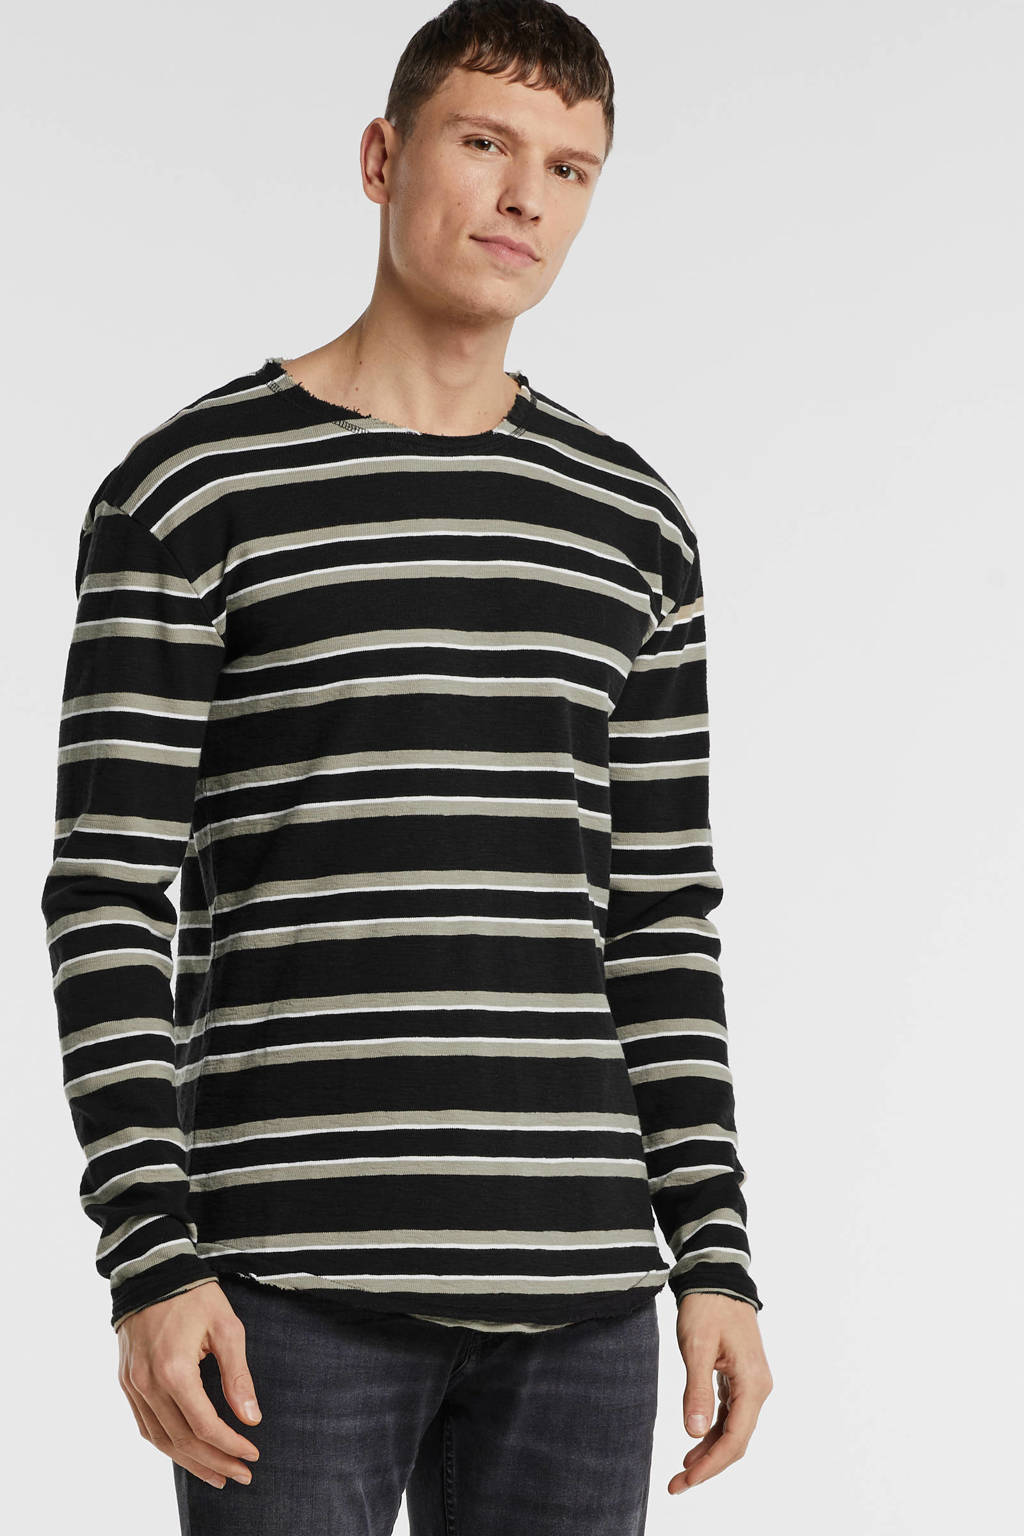 Tigha gestreepte sweater zwart/zand, Zwart/zand